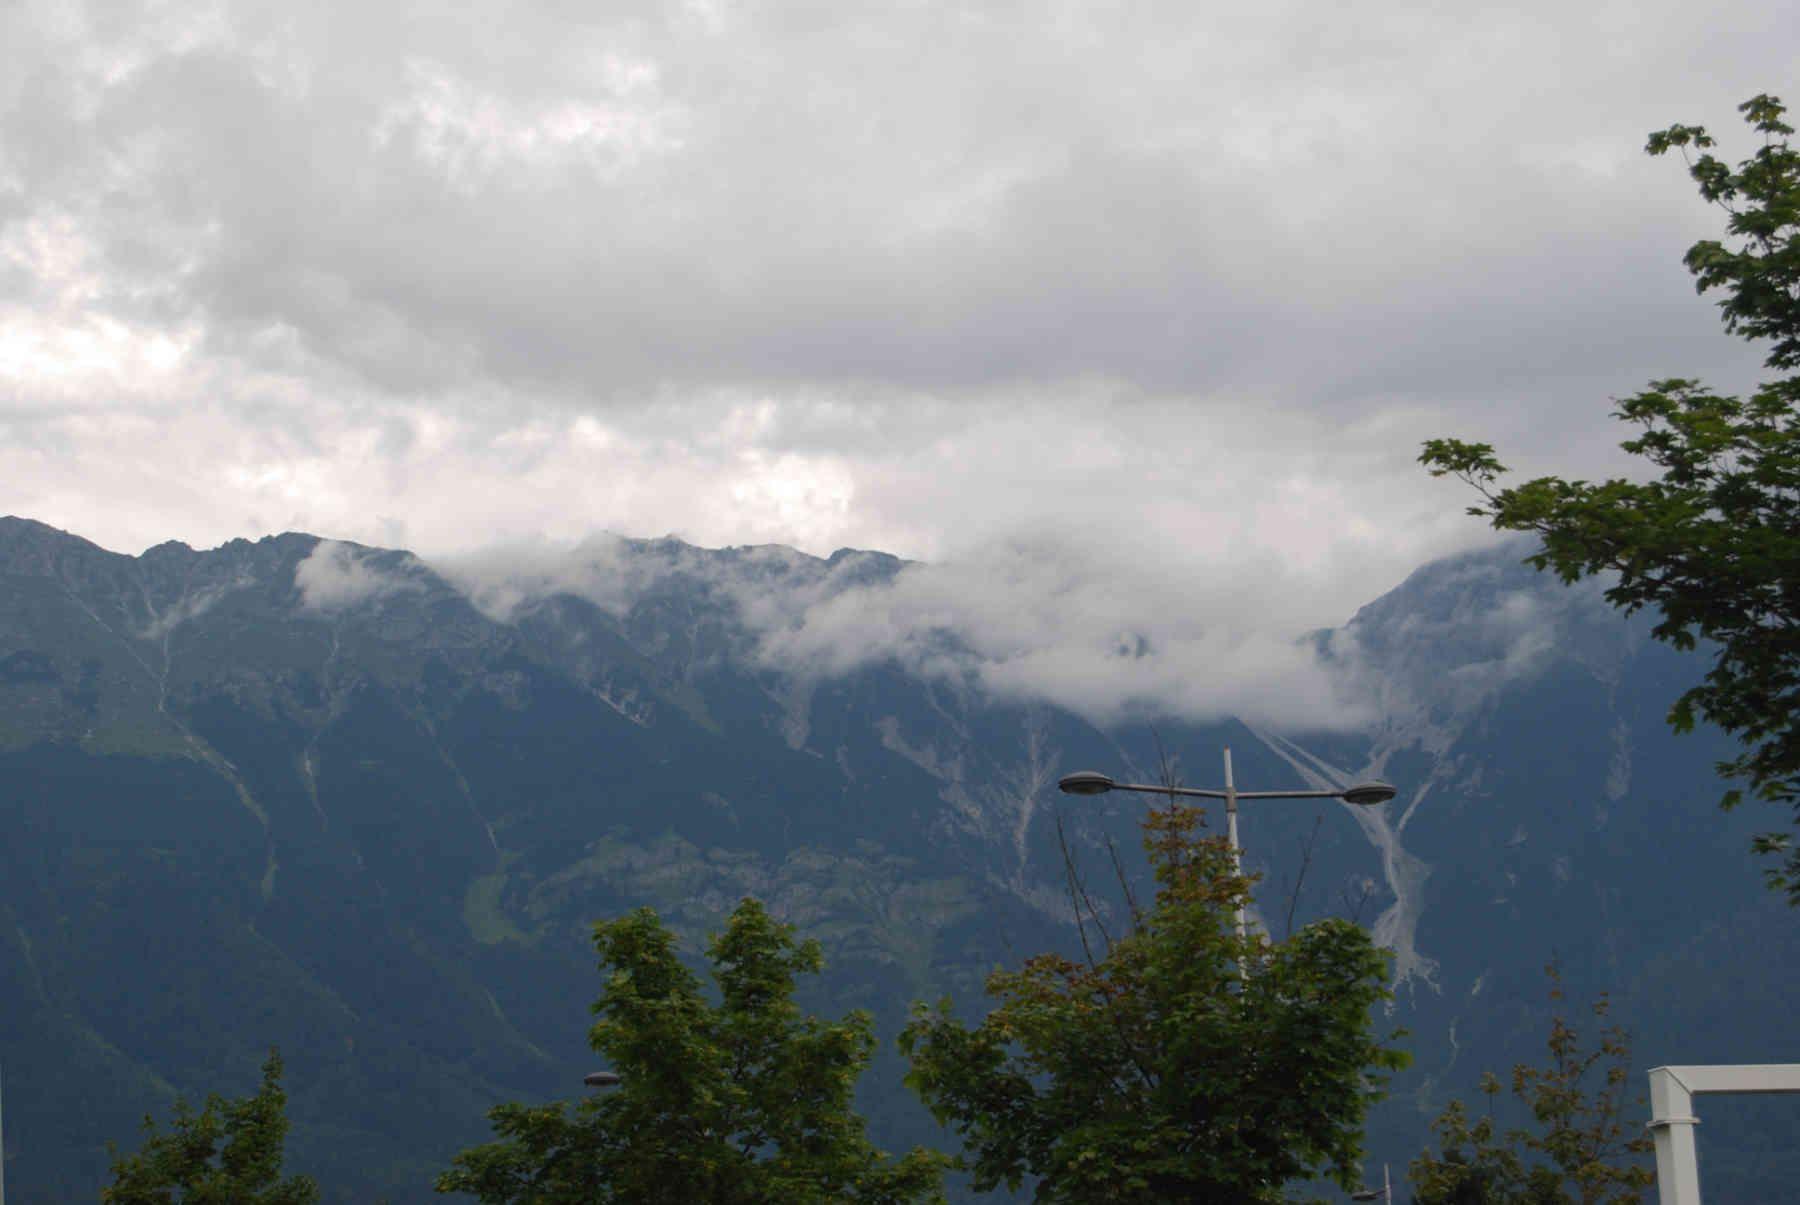 Roadtrip #1 : Innsbruck, Austria (Day 1)